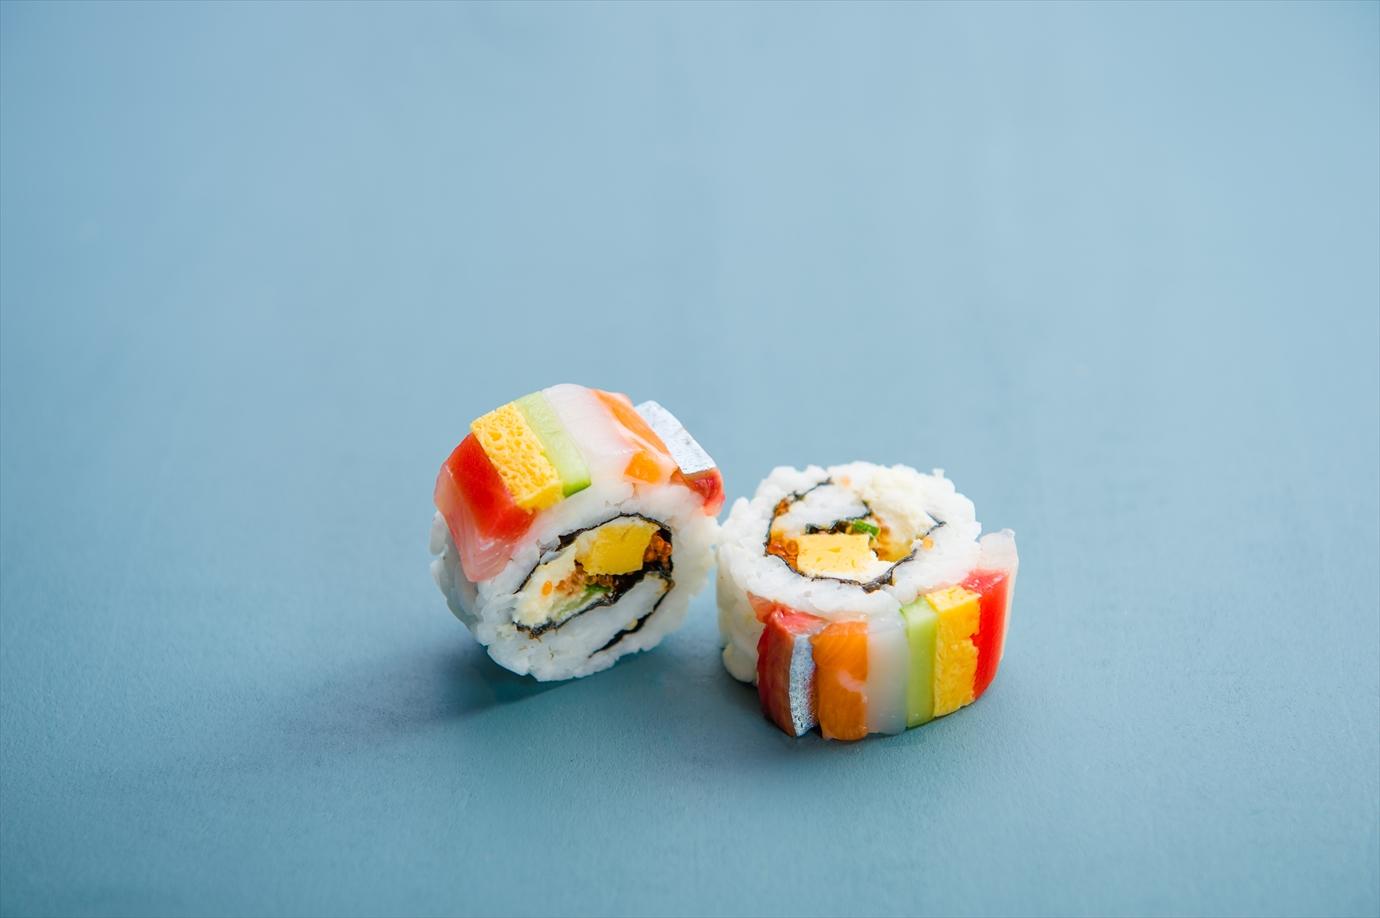 shari-the-tokyo-sushi-bar%e3%80%90%e3%83%ad%e3%83%bc%e3%83%ab%e5%af%bf%e5%8f%b8%e3%80%91%e3%83%ac%e3%82%a4%e3%83%b3%e3%83%9b%e3%82%99%e3%83%bc%e3%83%ad%e3%83%bc%e3%83%ab